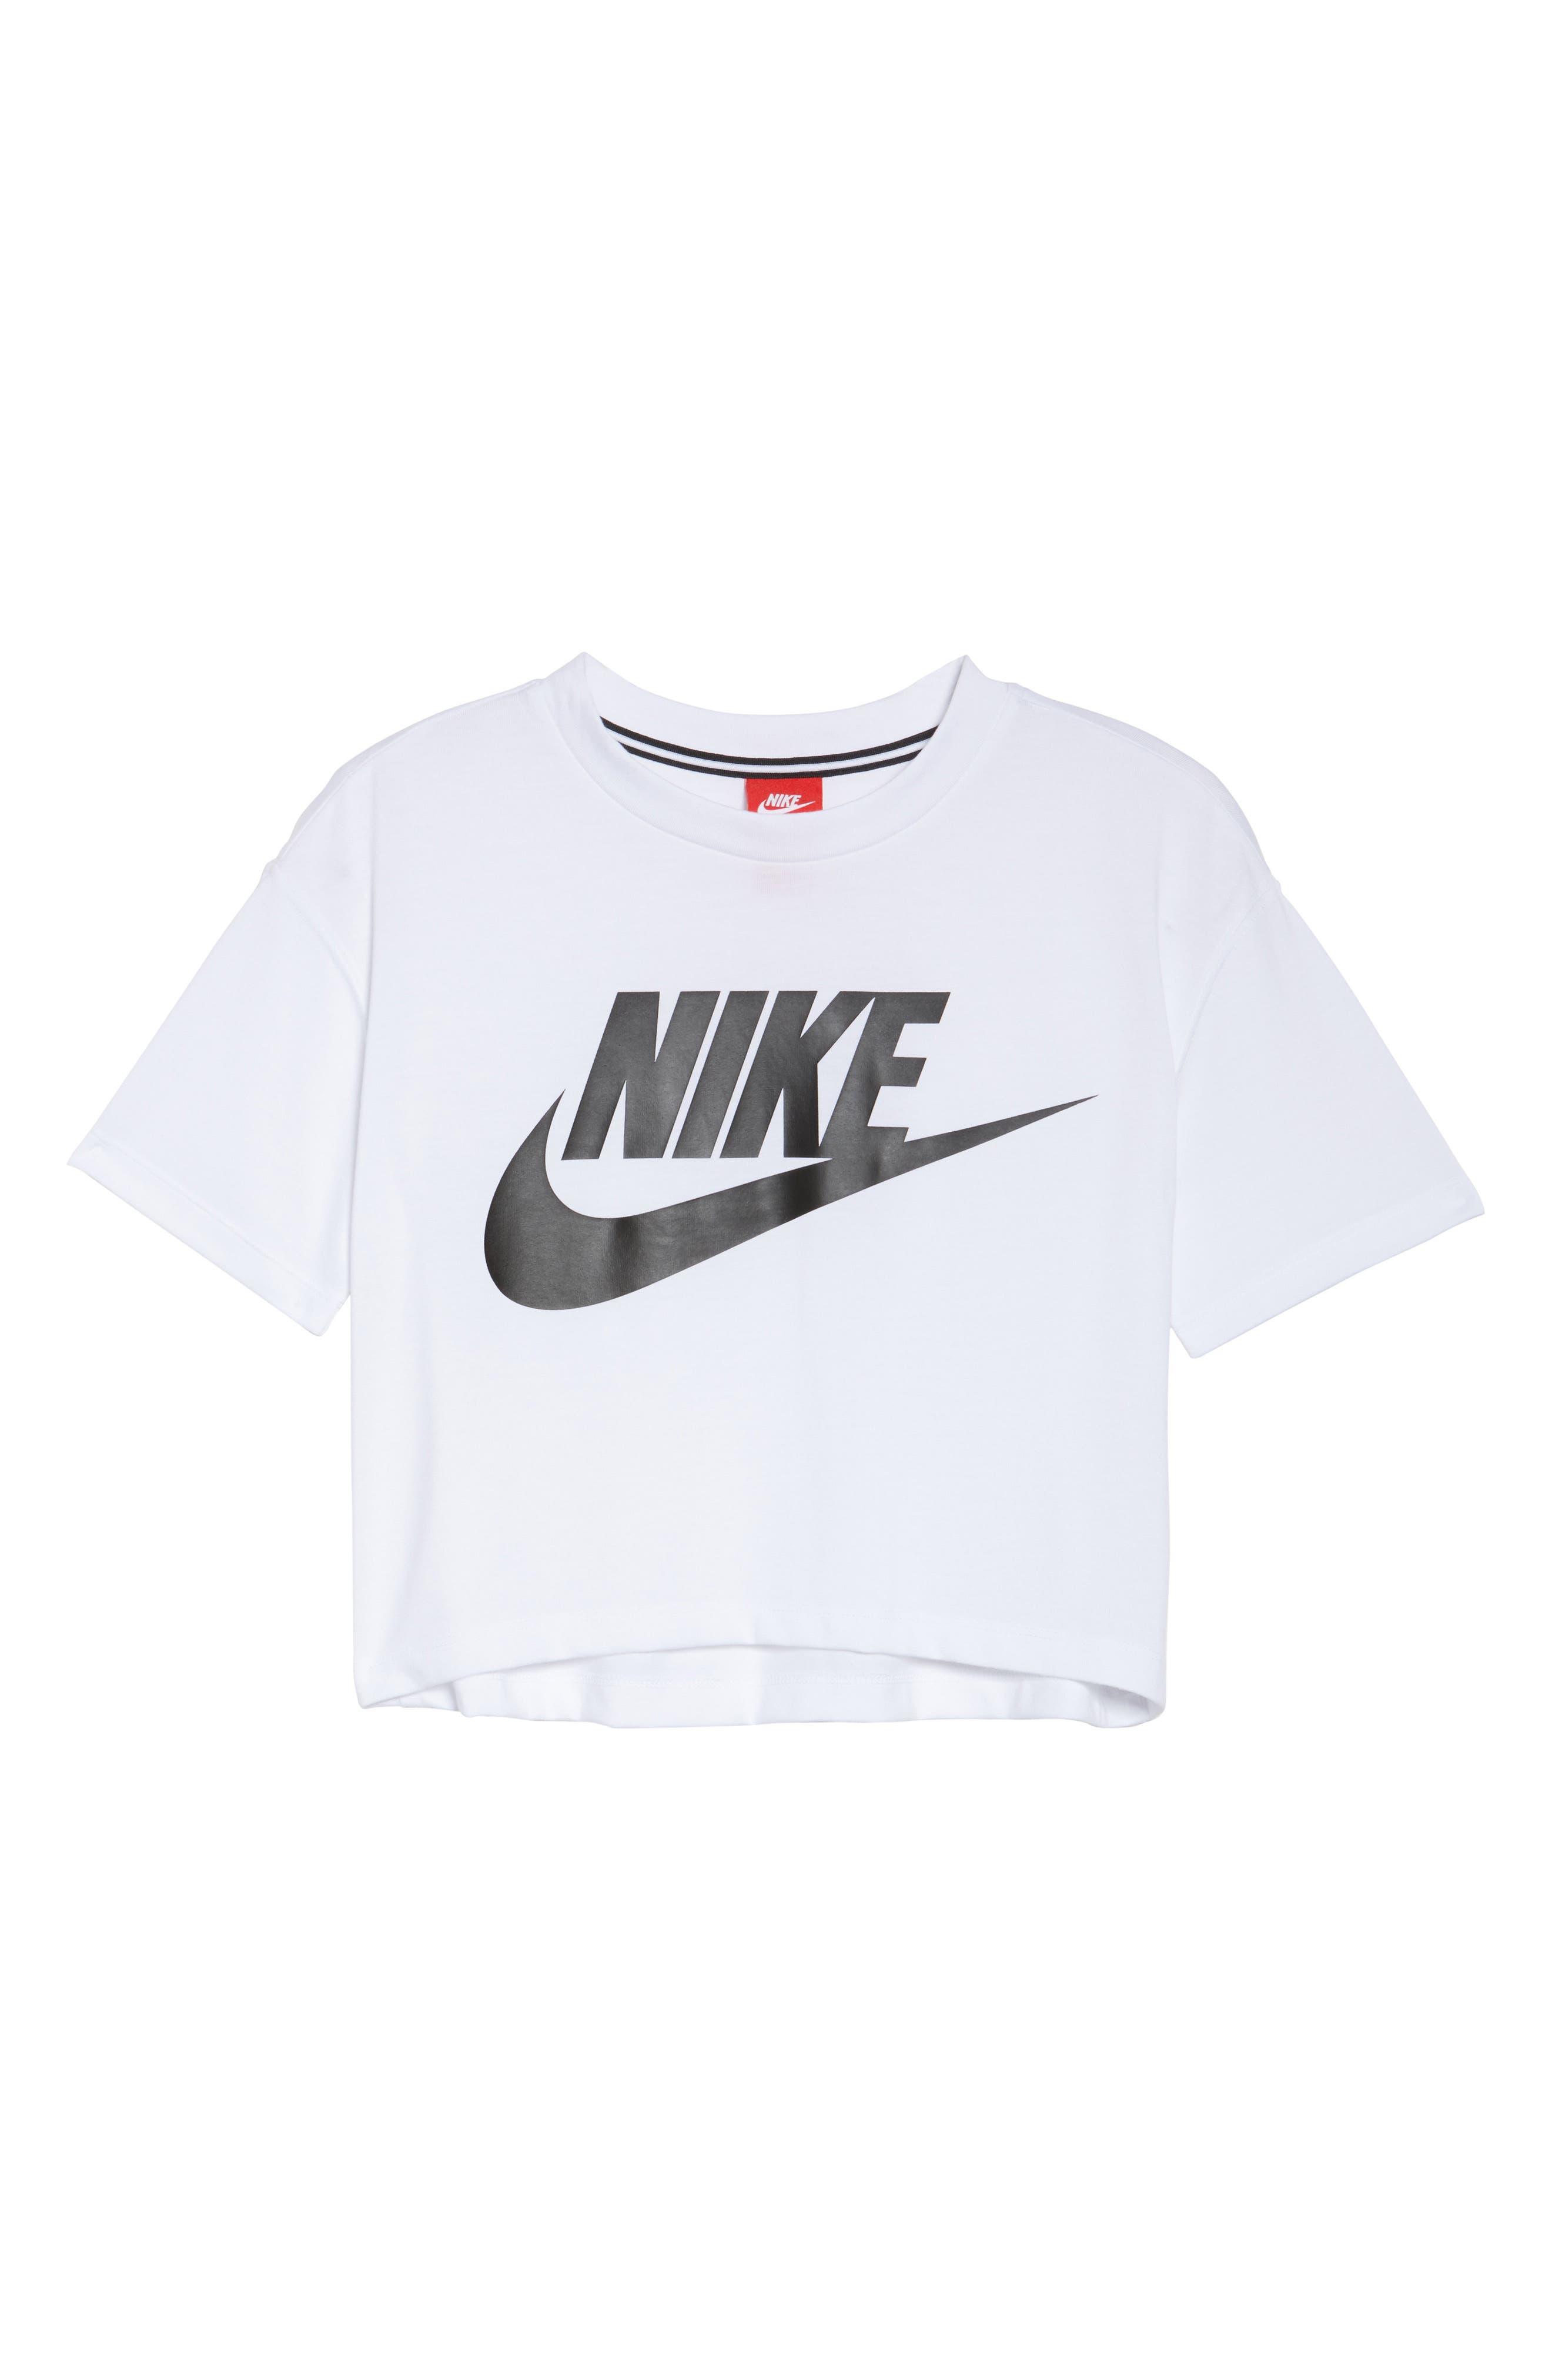 Sportswear Crop Top,                             Alternate thumbnail 7, color,                             WHITE/ BLACK